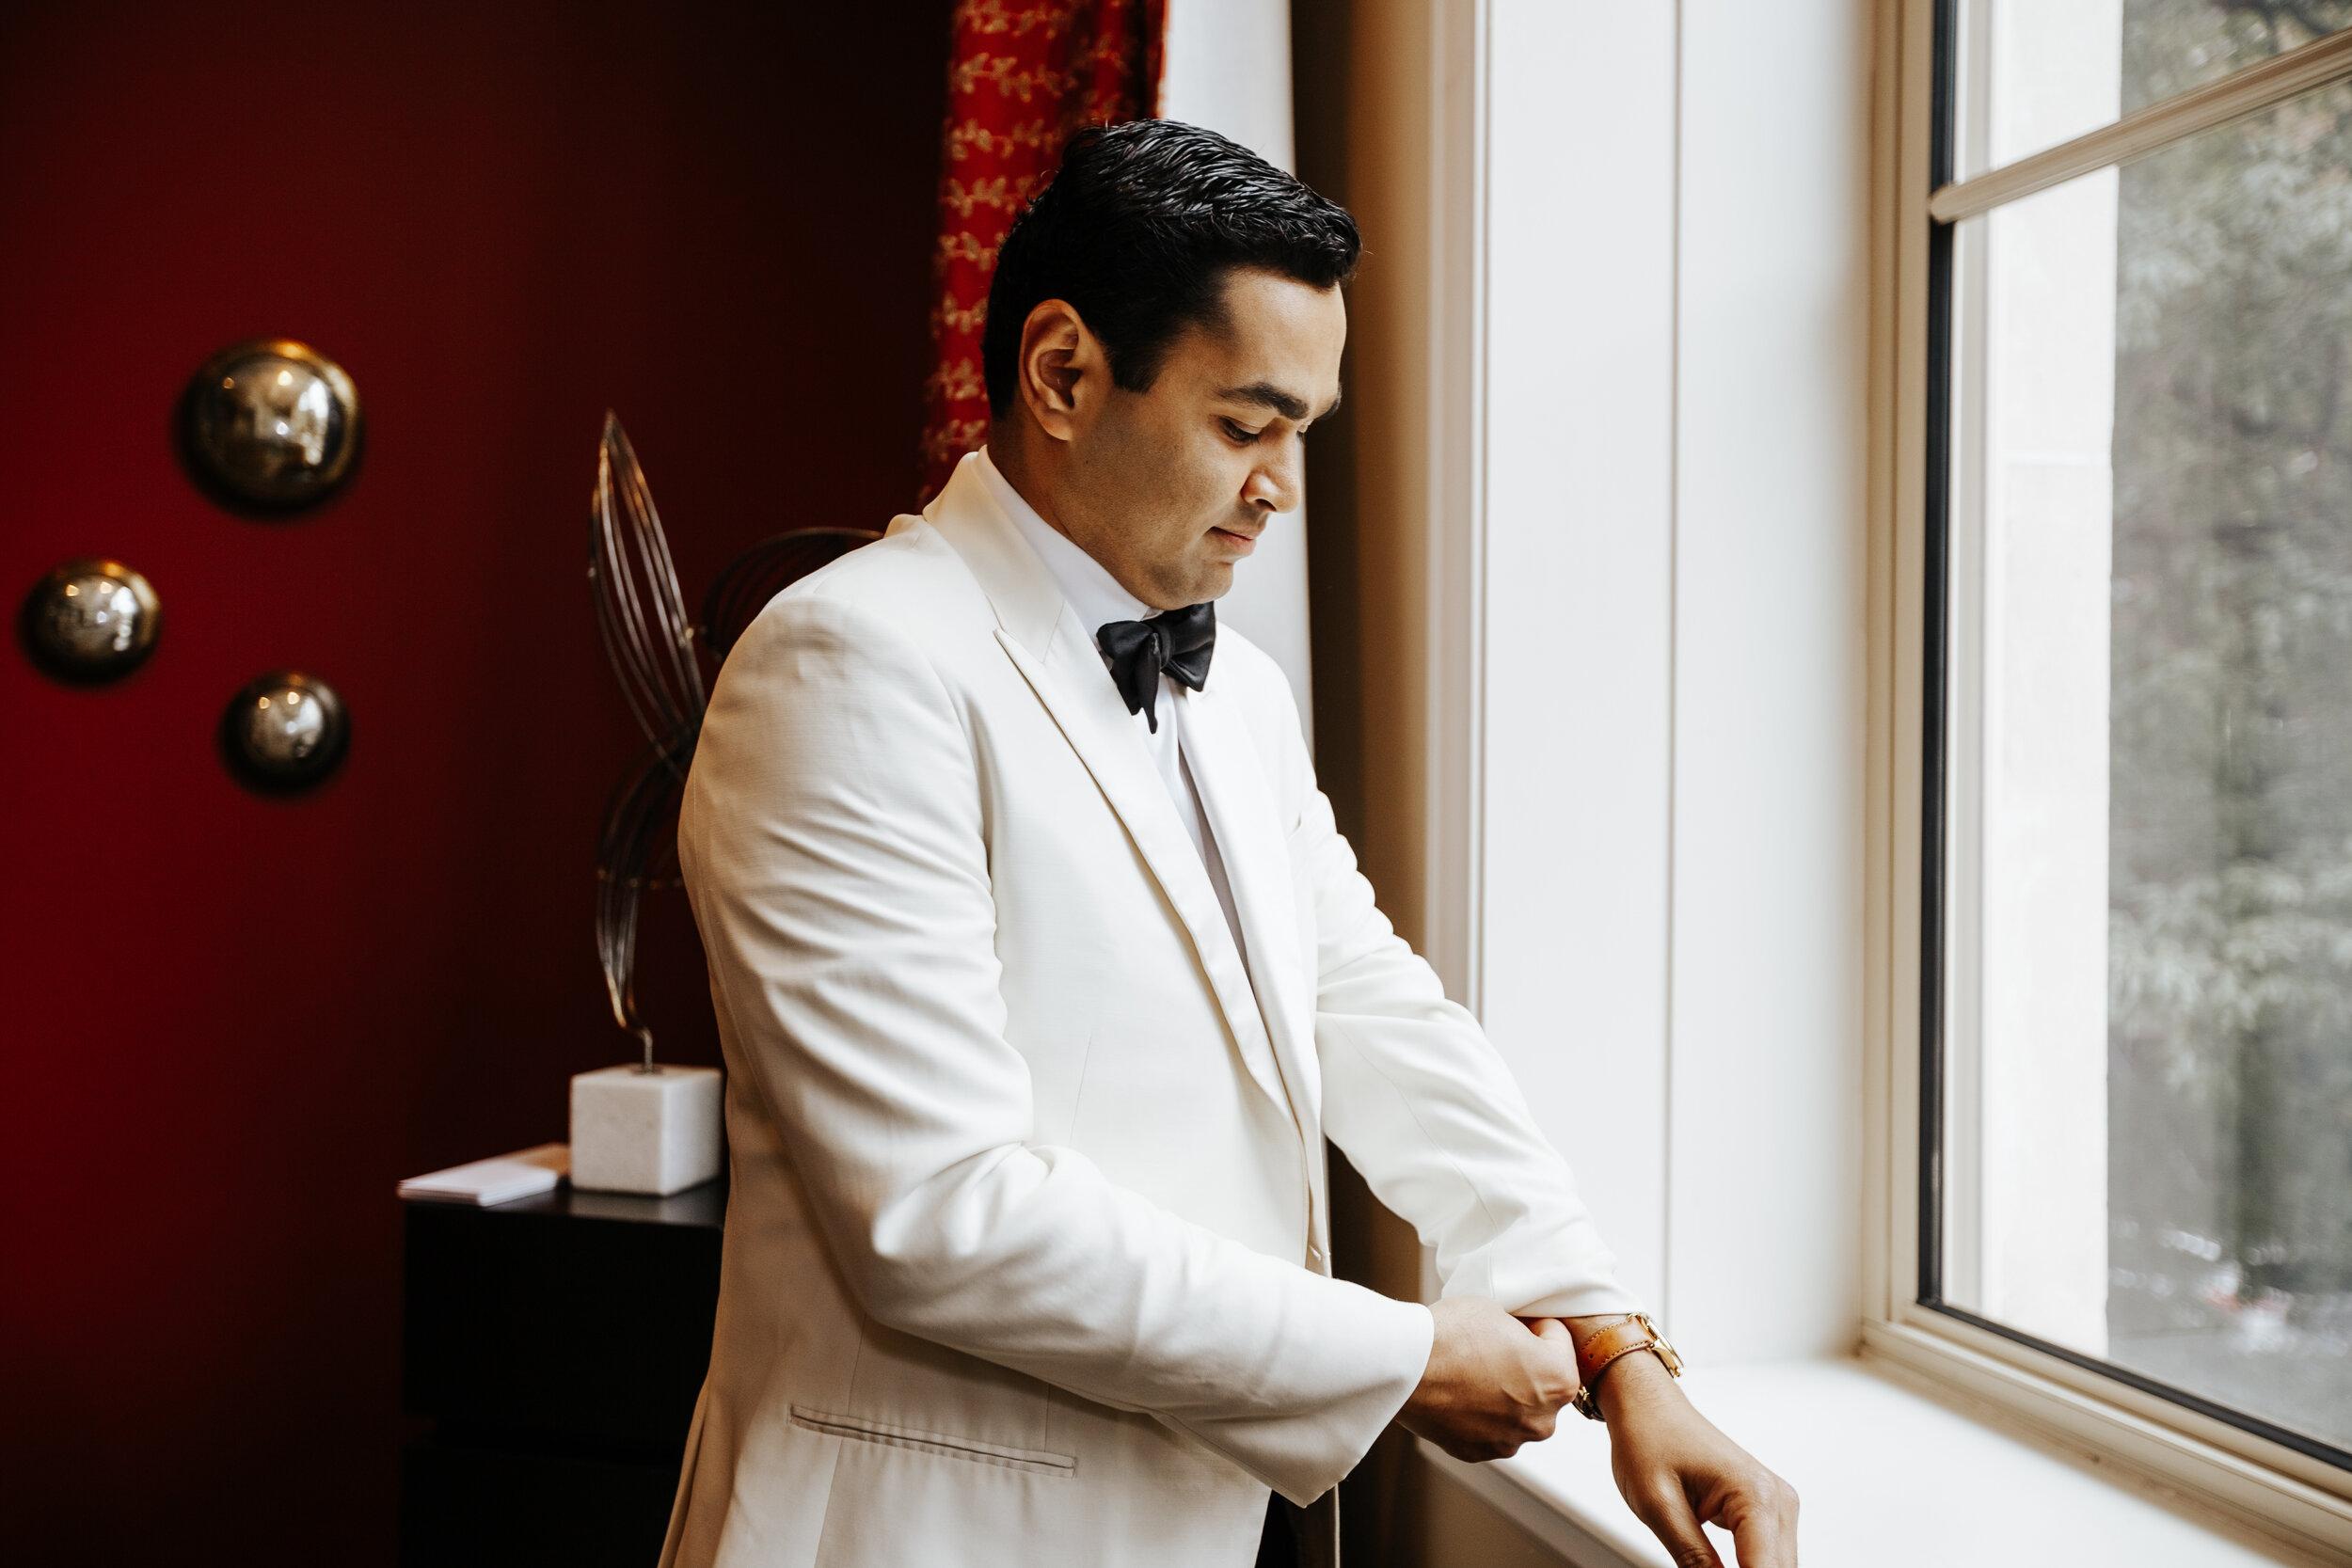 Cassie-Mrunal-Wedding-Quirk-Hotel-John-Marshall-Ballrooms-Richmond-Virginia-Photography-by-V-25.jpg